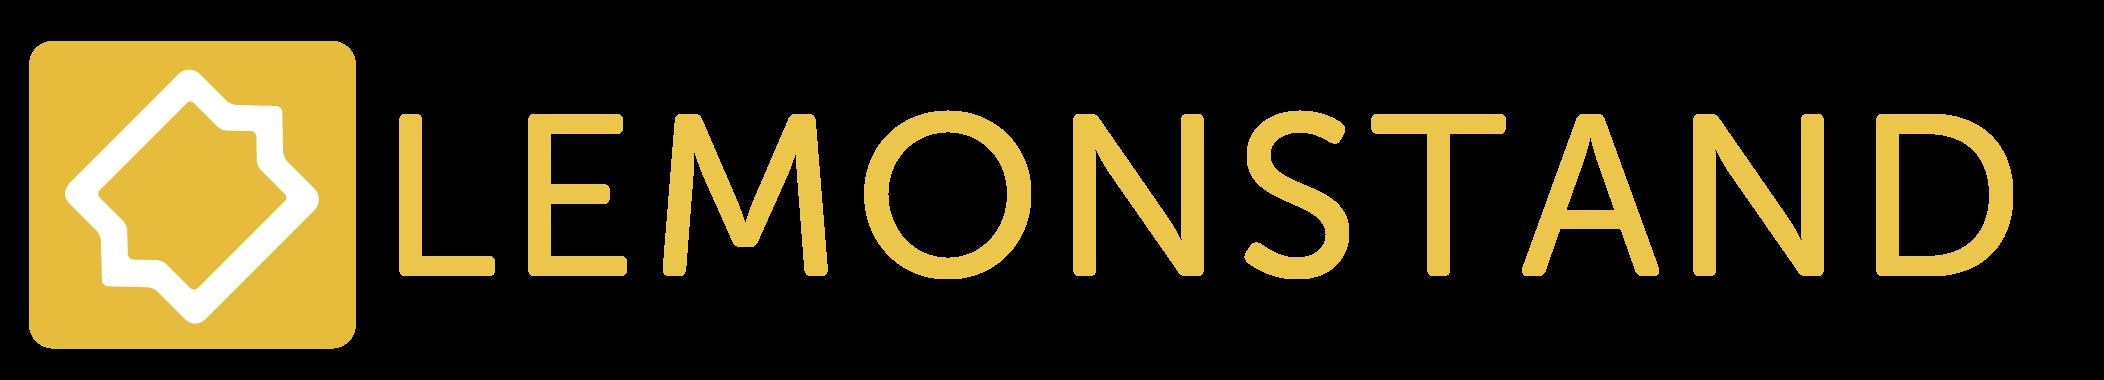 logo_lemonstand.png